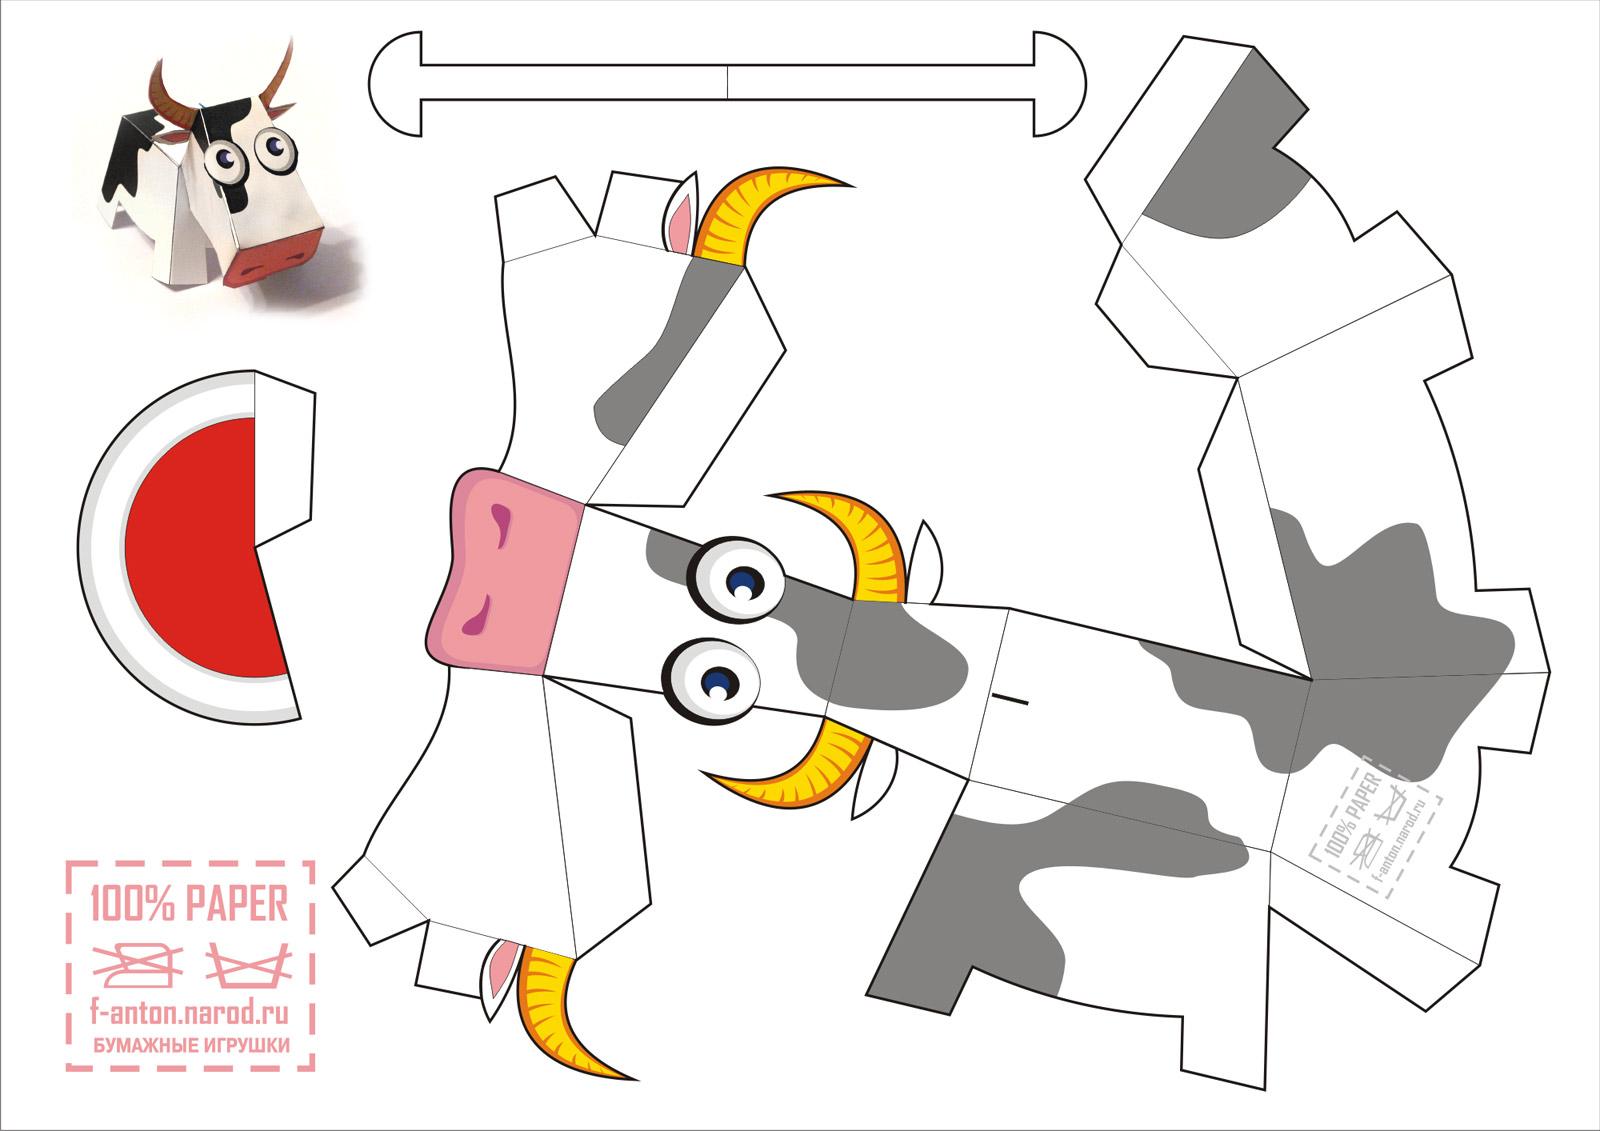 http://f-anton.narod.ru/im/paper/cow2009.jpg